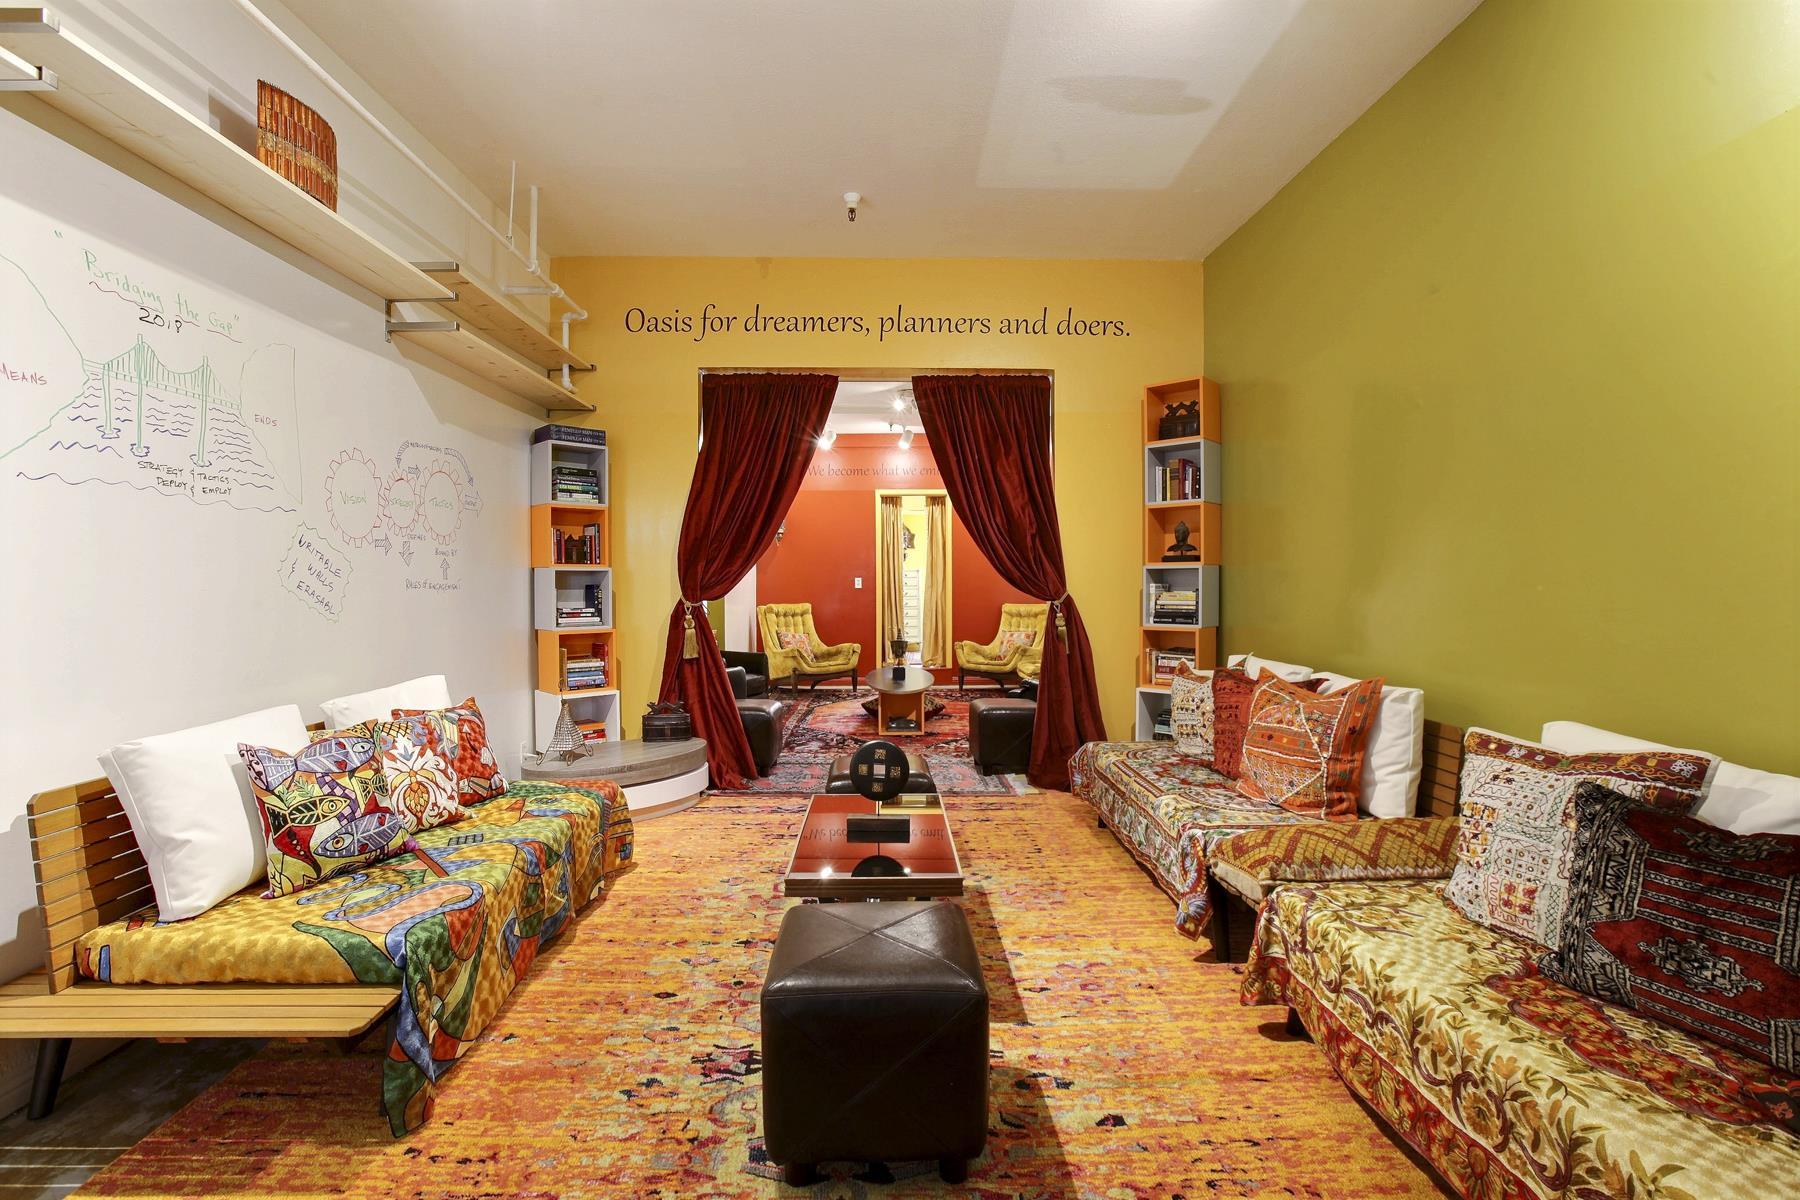 Kemitian Lounge - Kemitian Lounge - A retake on Ideation